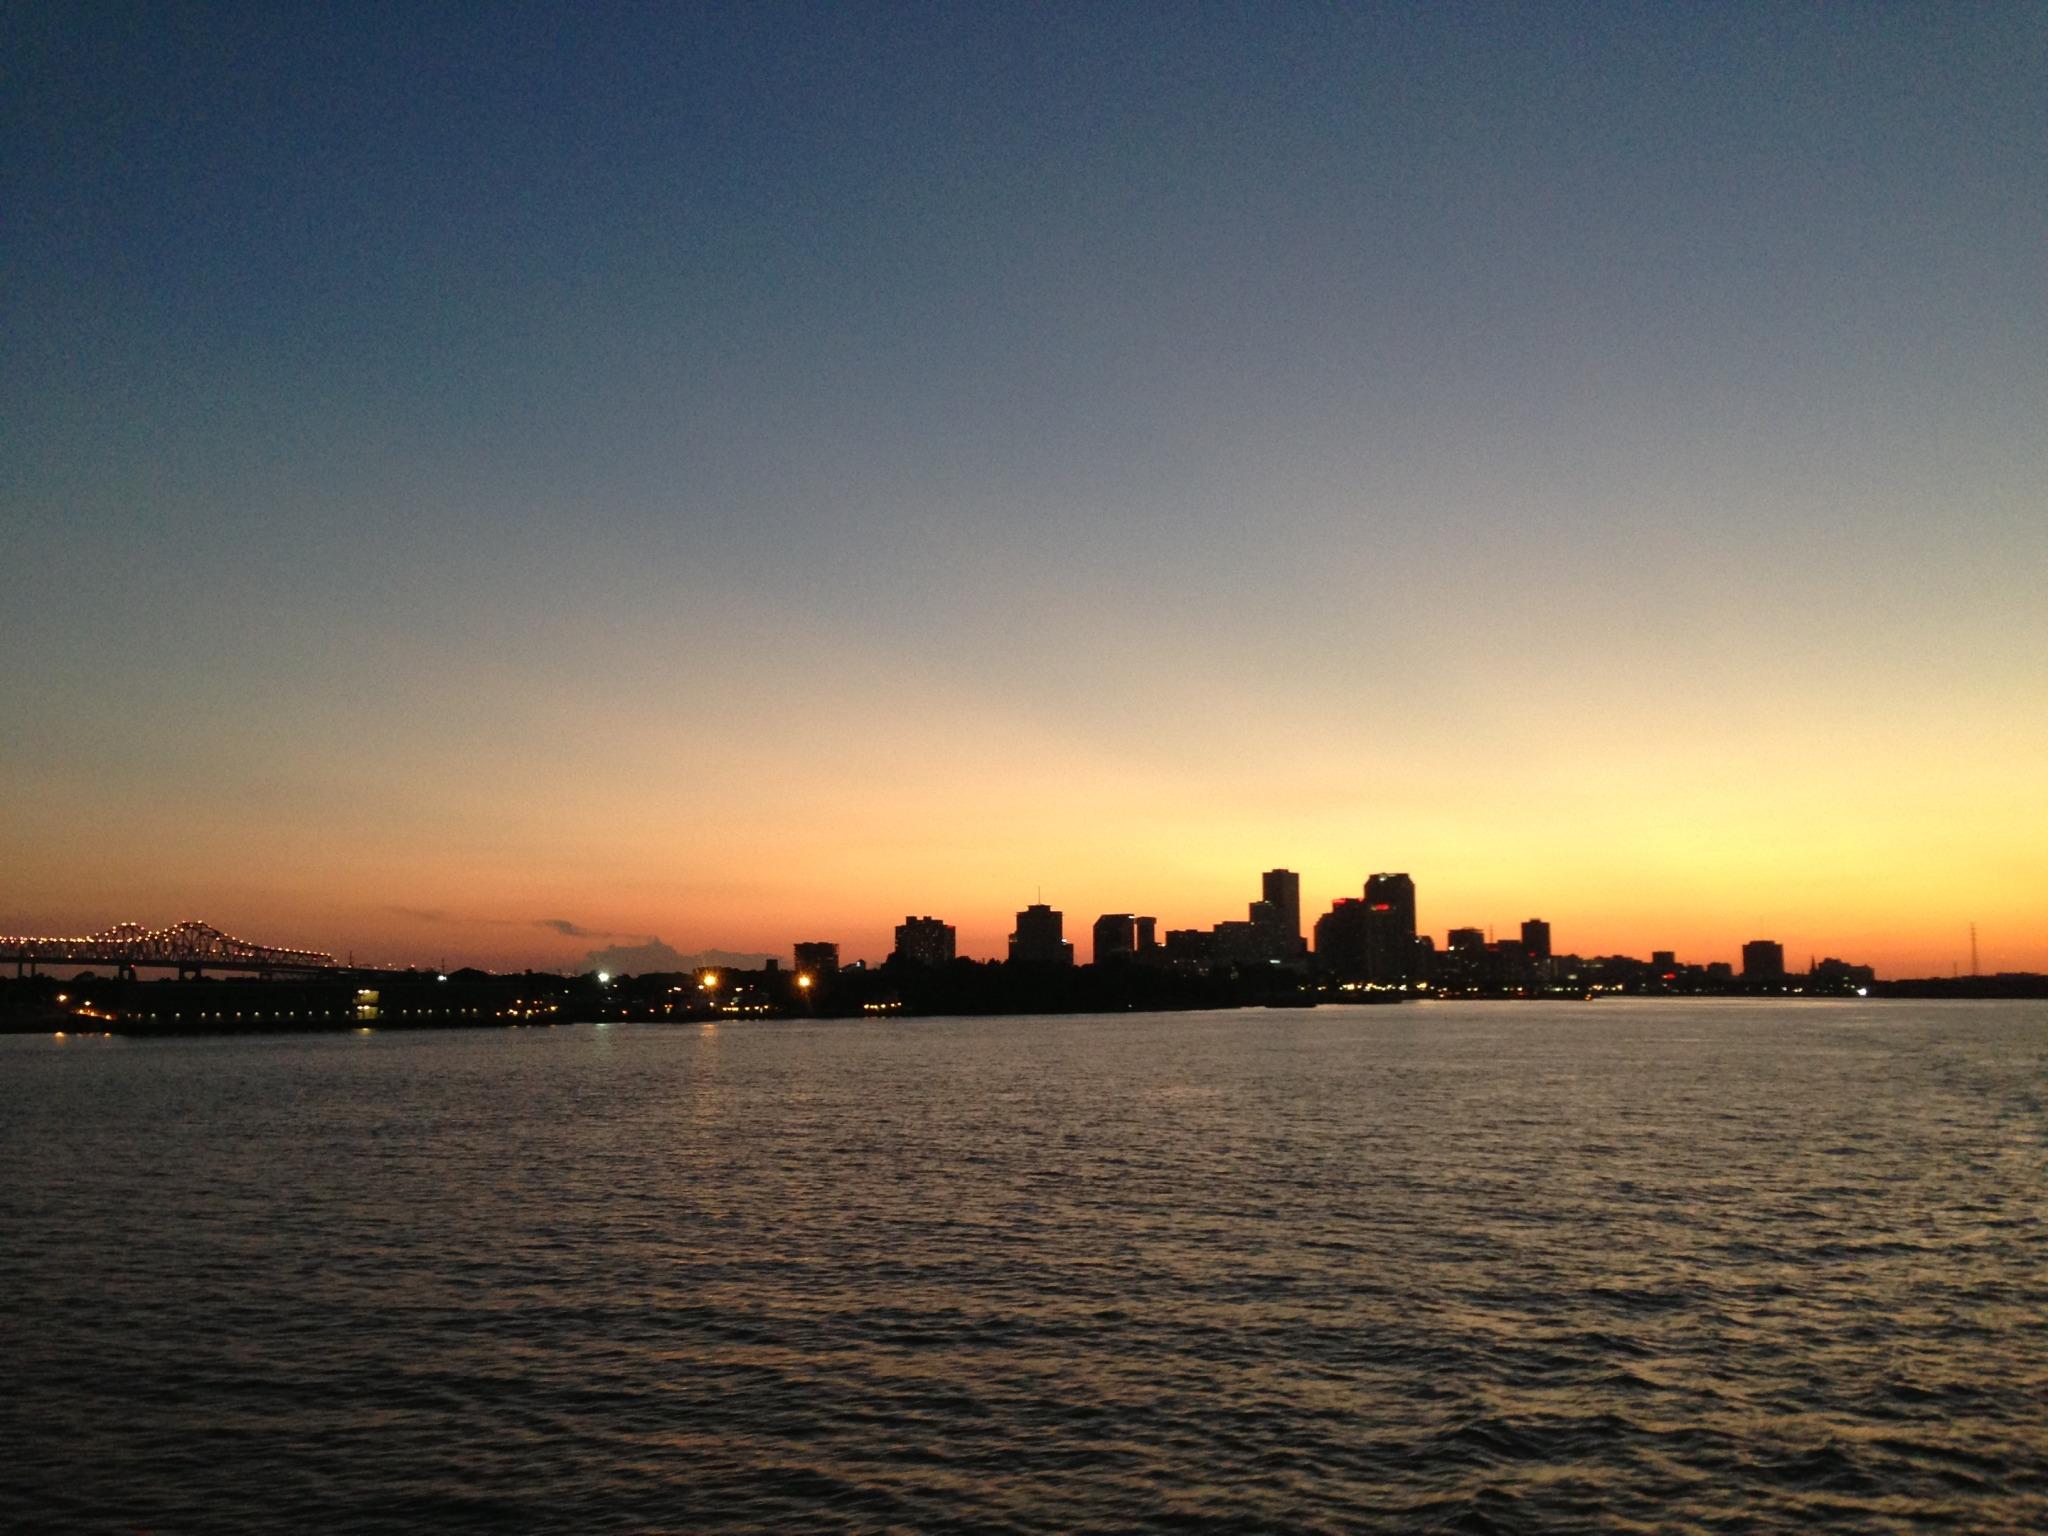 Sendi - Skyline of new orleans